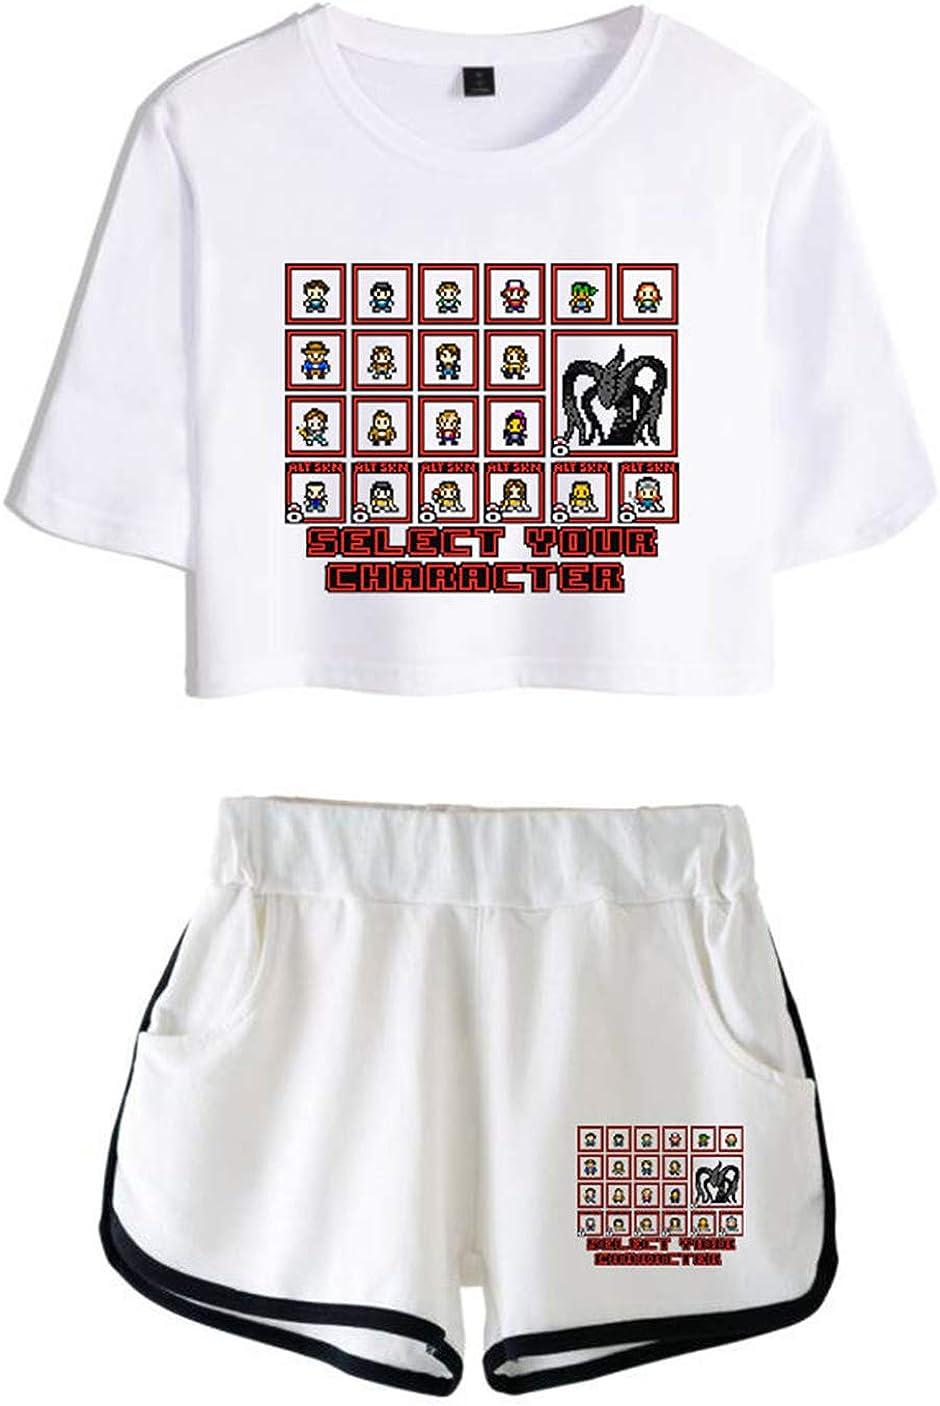 HUASON Stranger Things Bambine e Ragazze Crop Top T-Shirt e Shorts Strada Moda Abbigliamento Sportivo Set